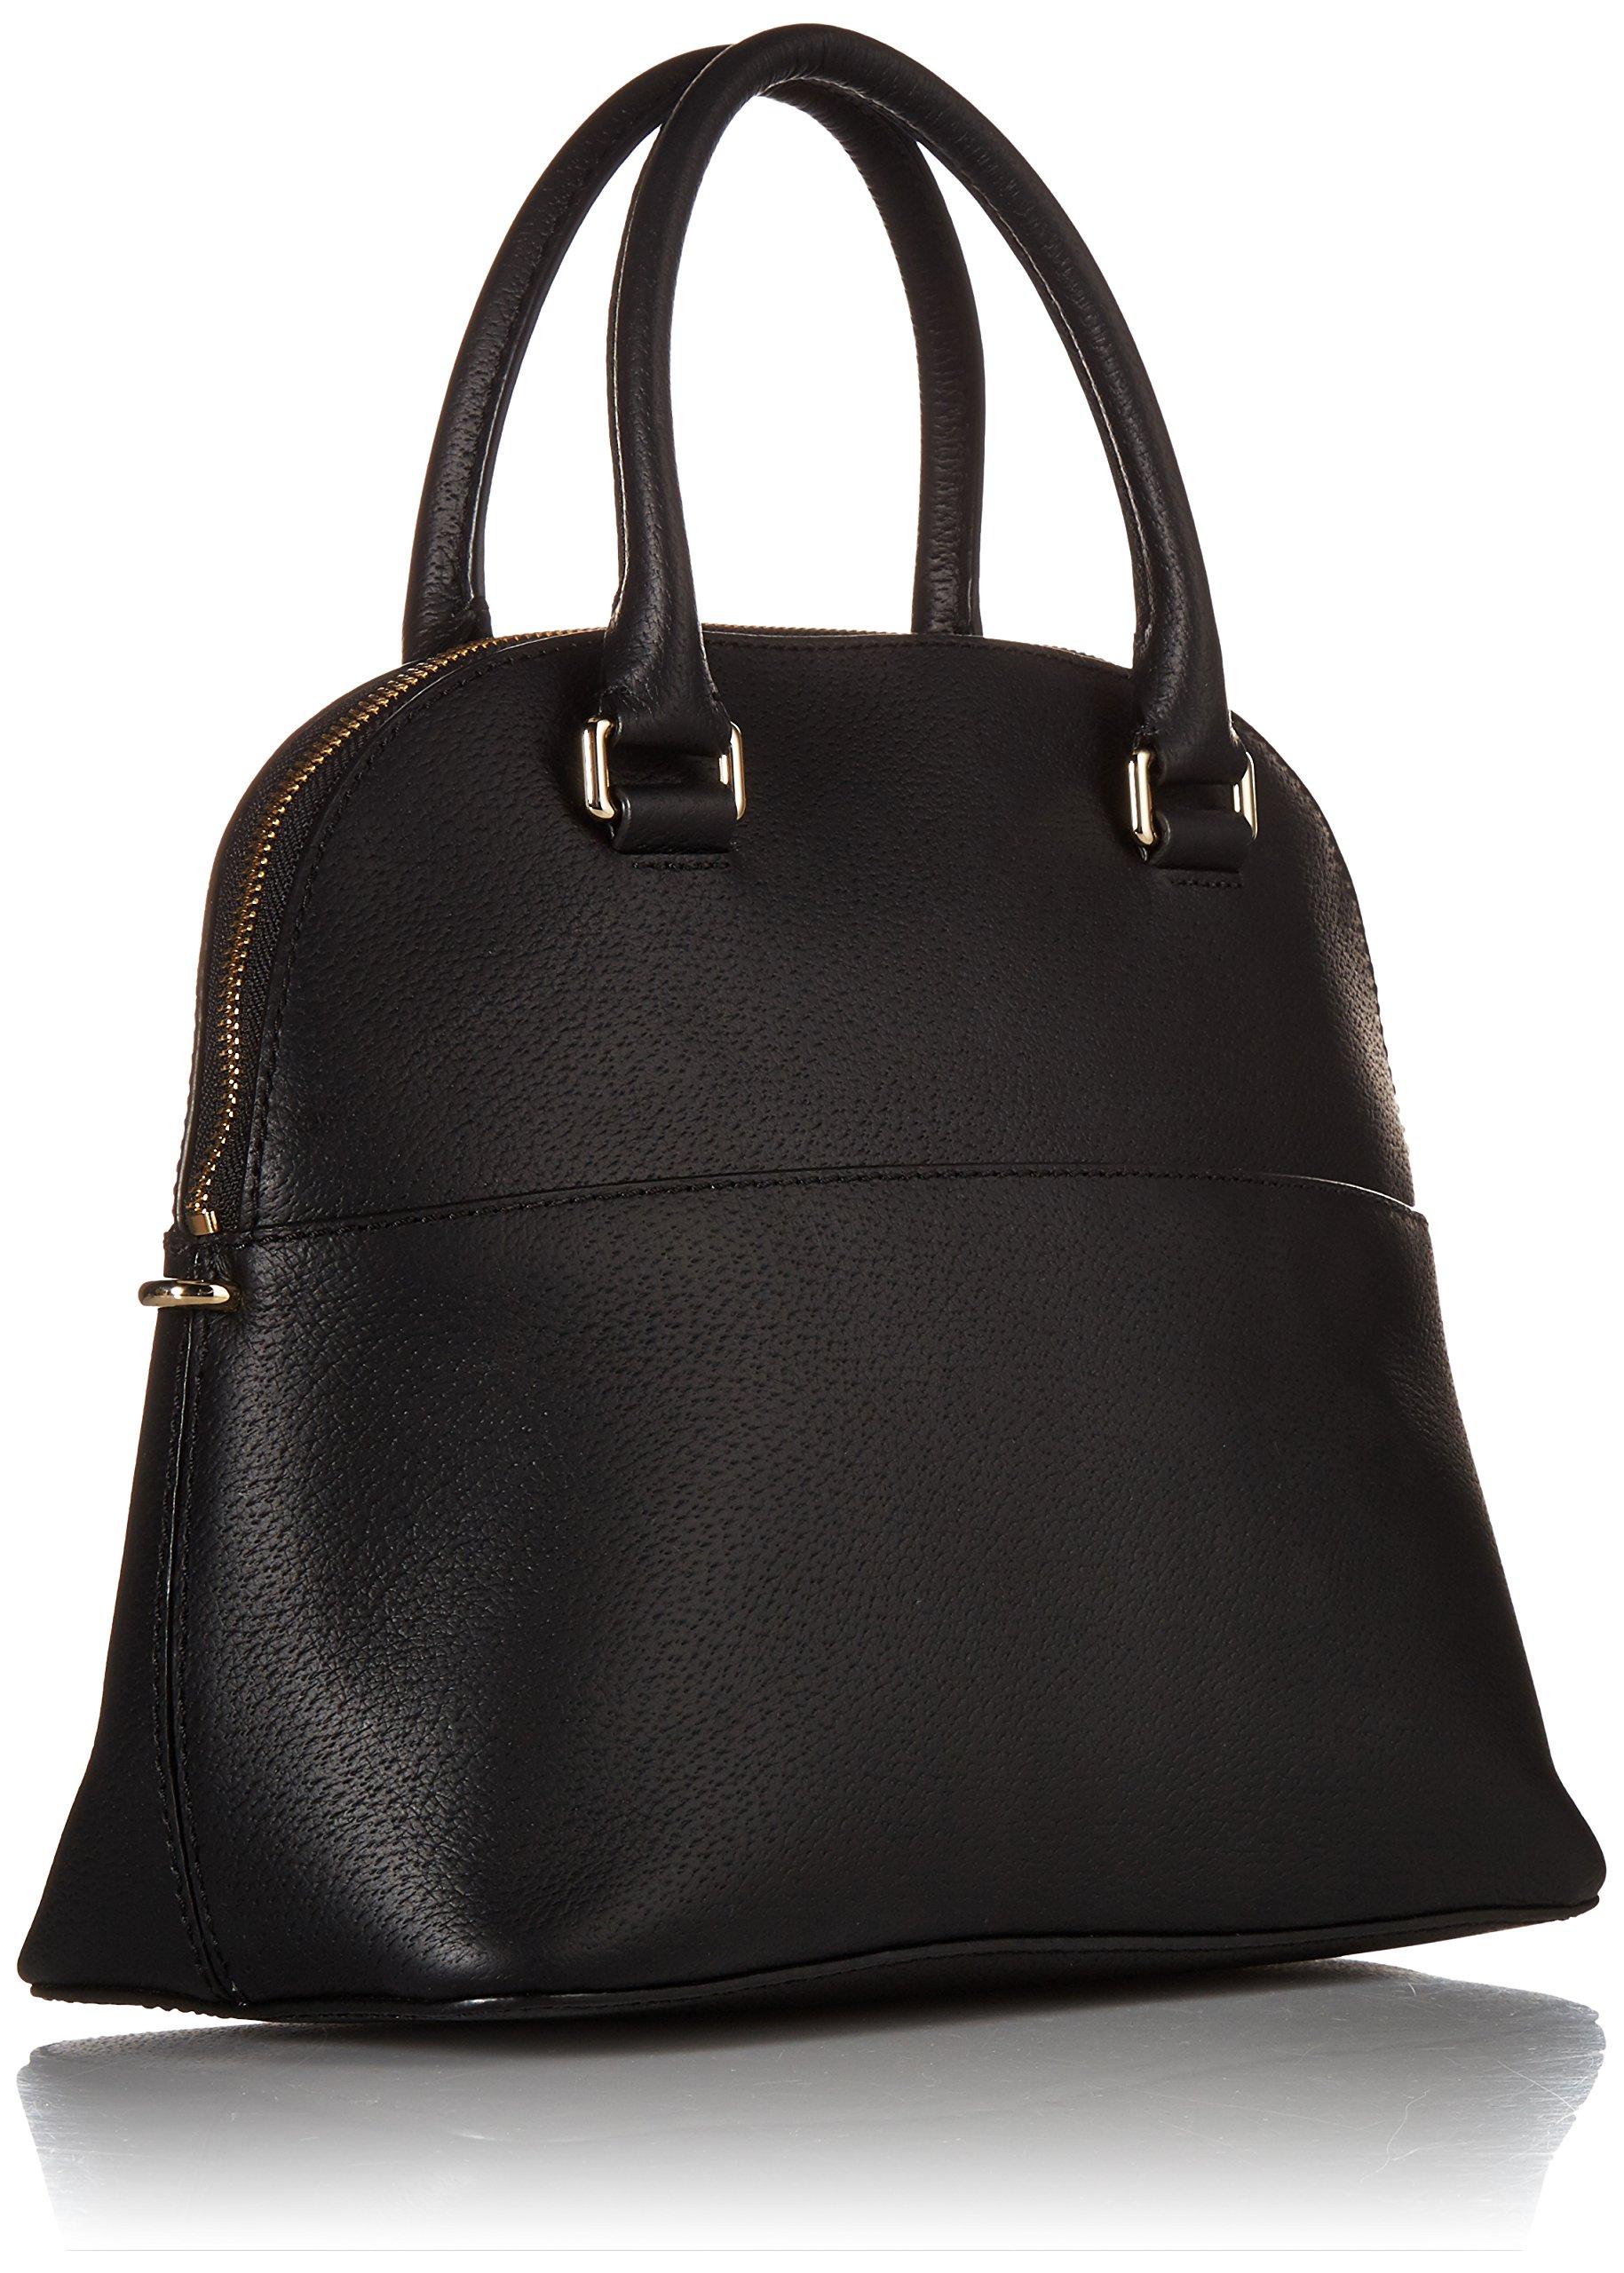 Kate Spade Grove Street Carli Leather Crossbody Bag Purse Satchel Shoulder  Bag bc3d1b542425a